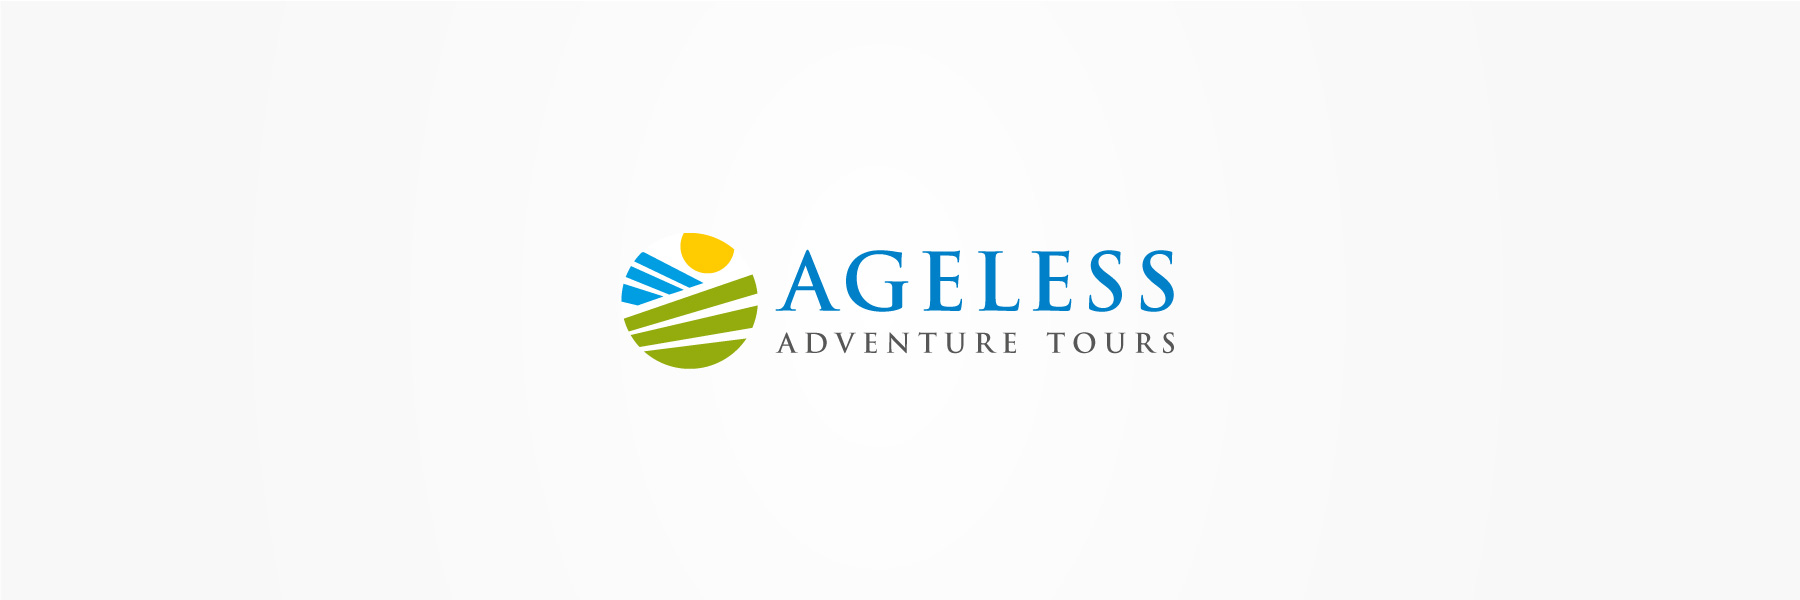 Ageless-Adventure-Tours-Logo-Design